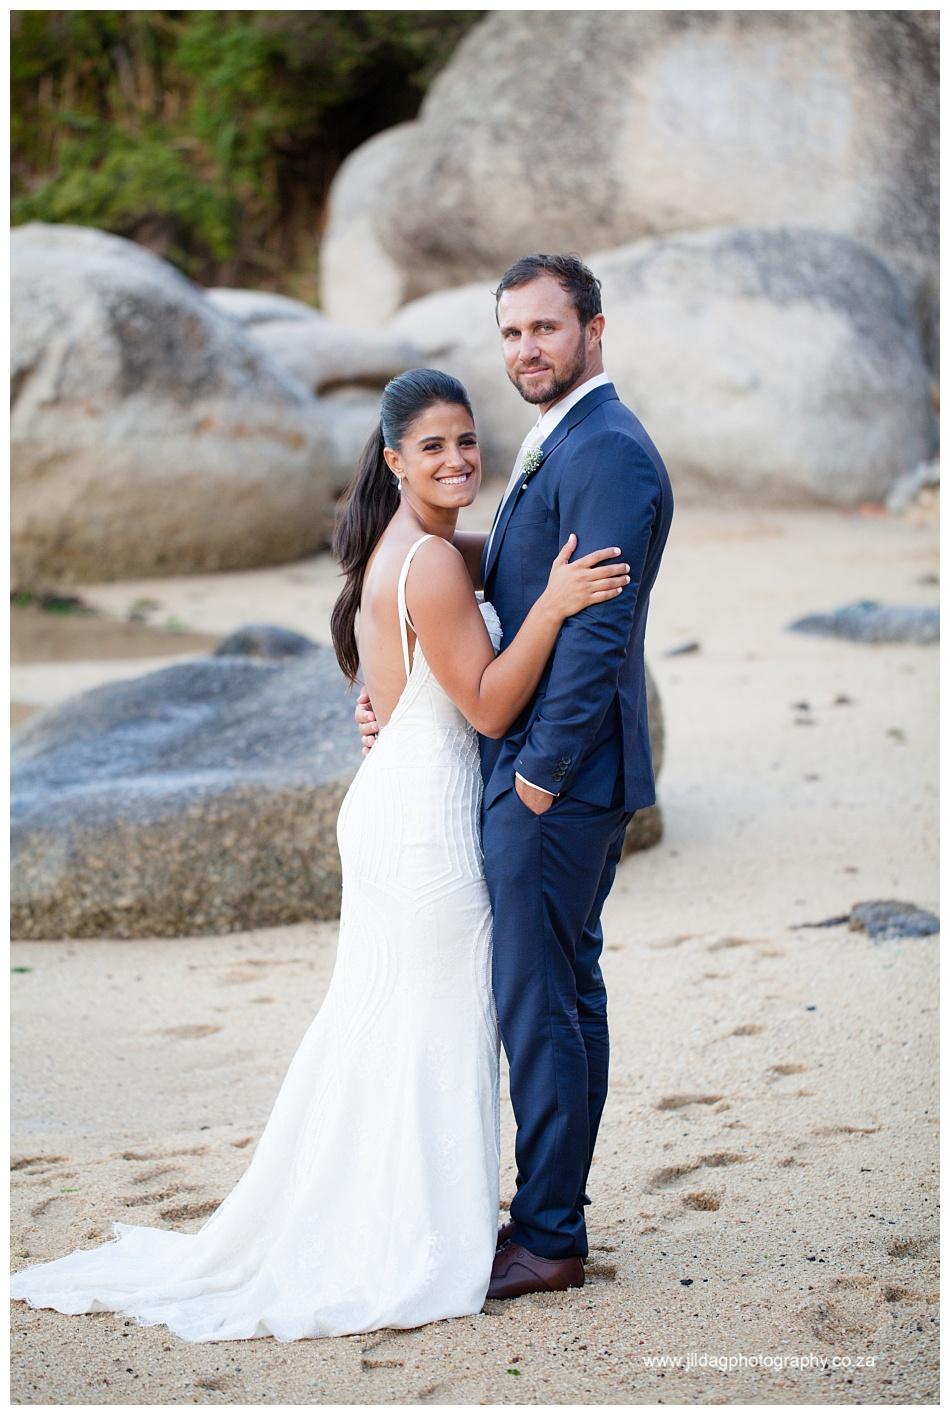 Jilda-G-Photography-12-Apostles-wedding_1760